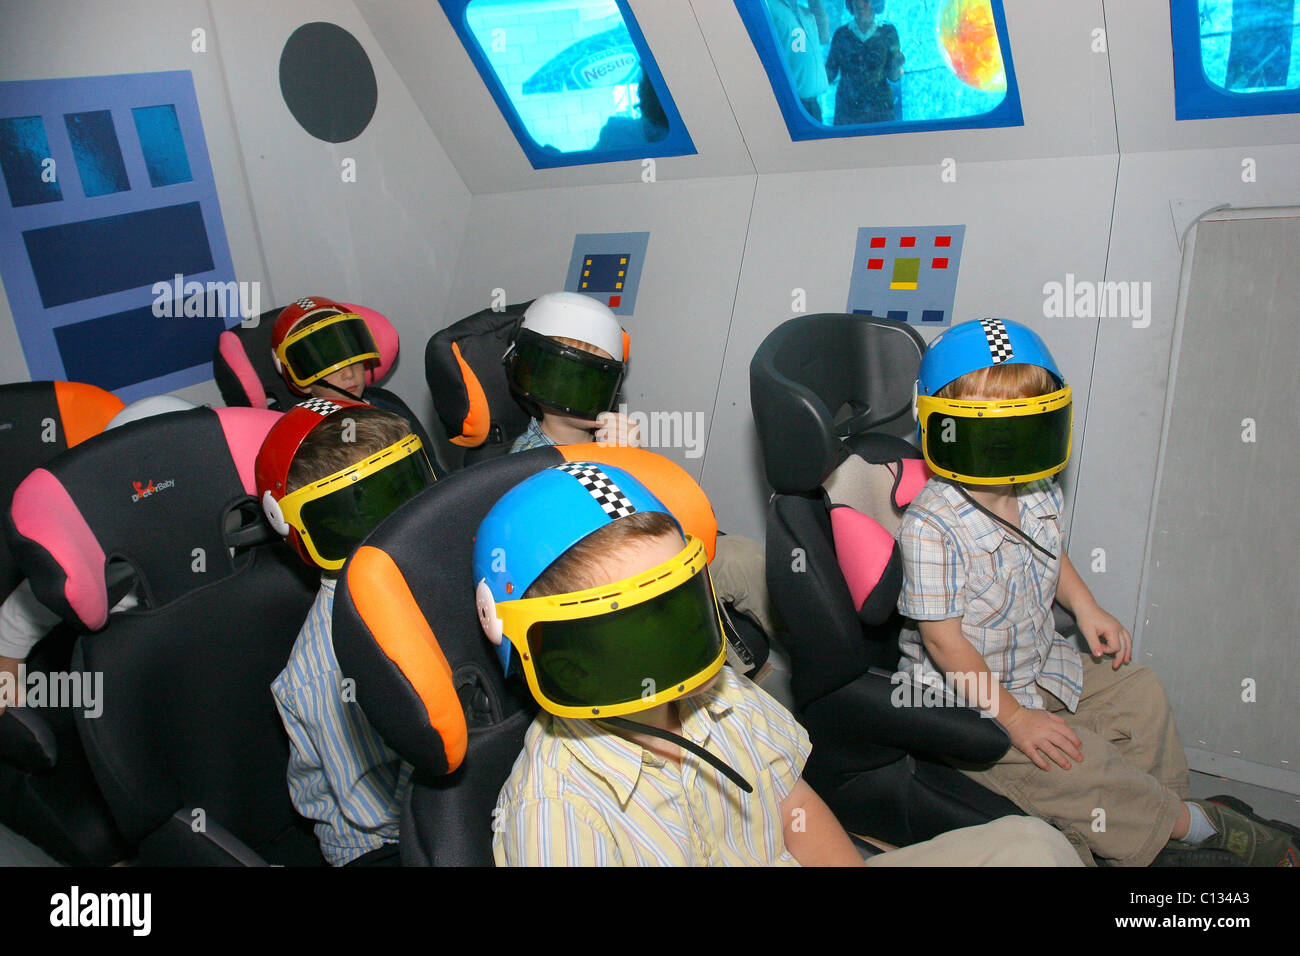 space shuttle simulator vr - photo #8